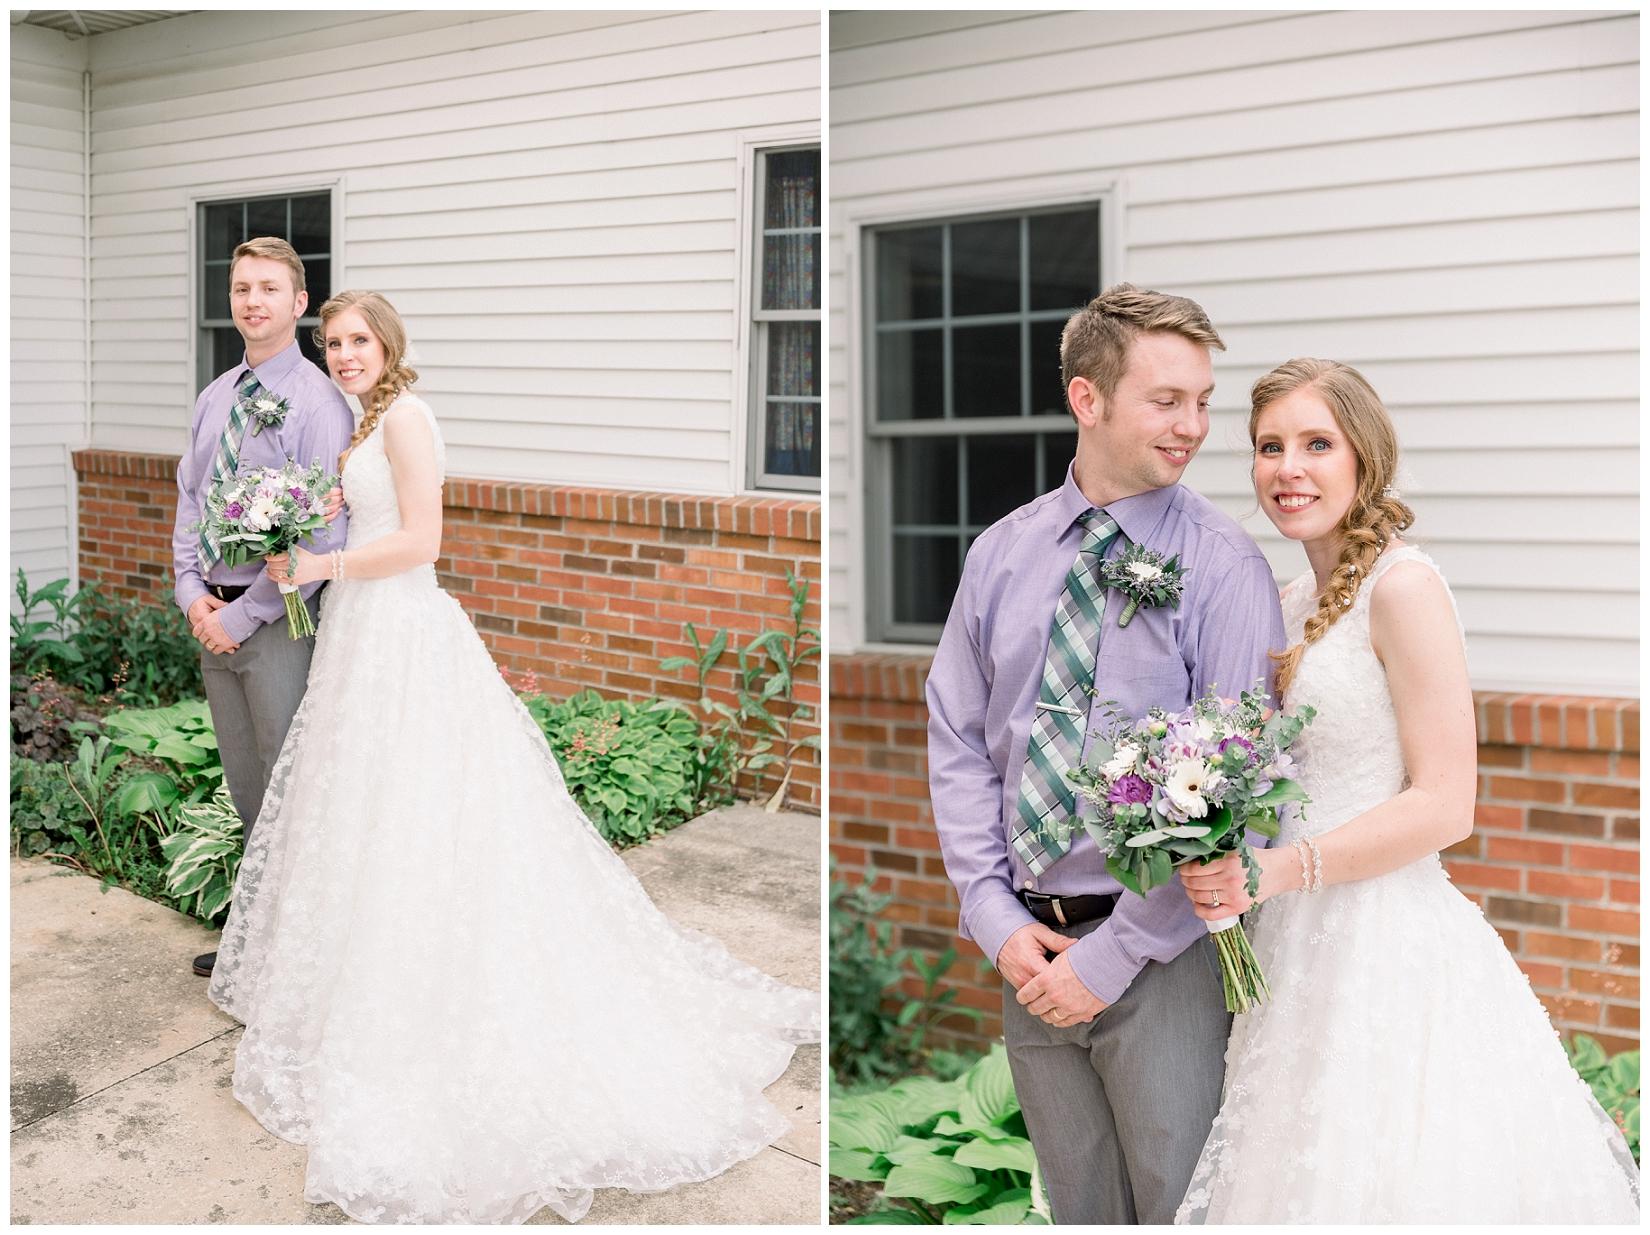 cat-alkire-wedding-photographer-indiana-chicago-indianapolis-fort-wayne_1321.jpg